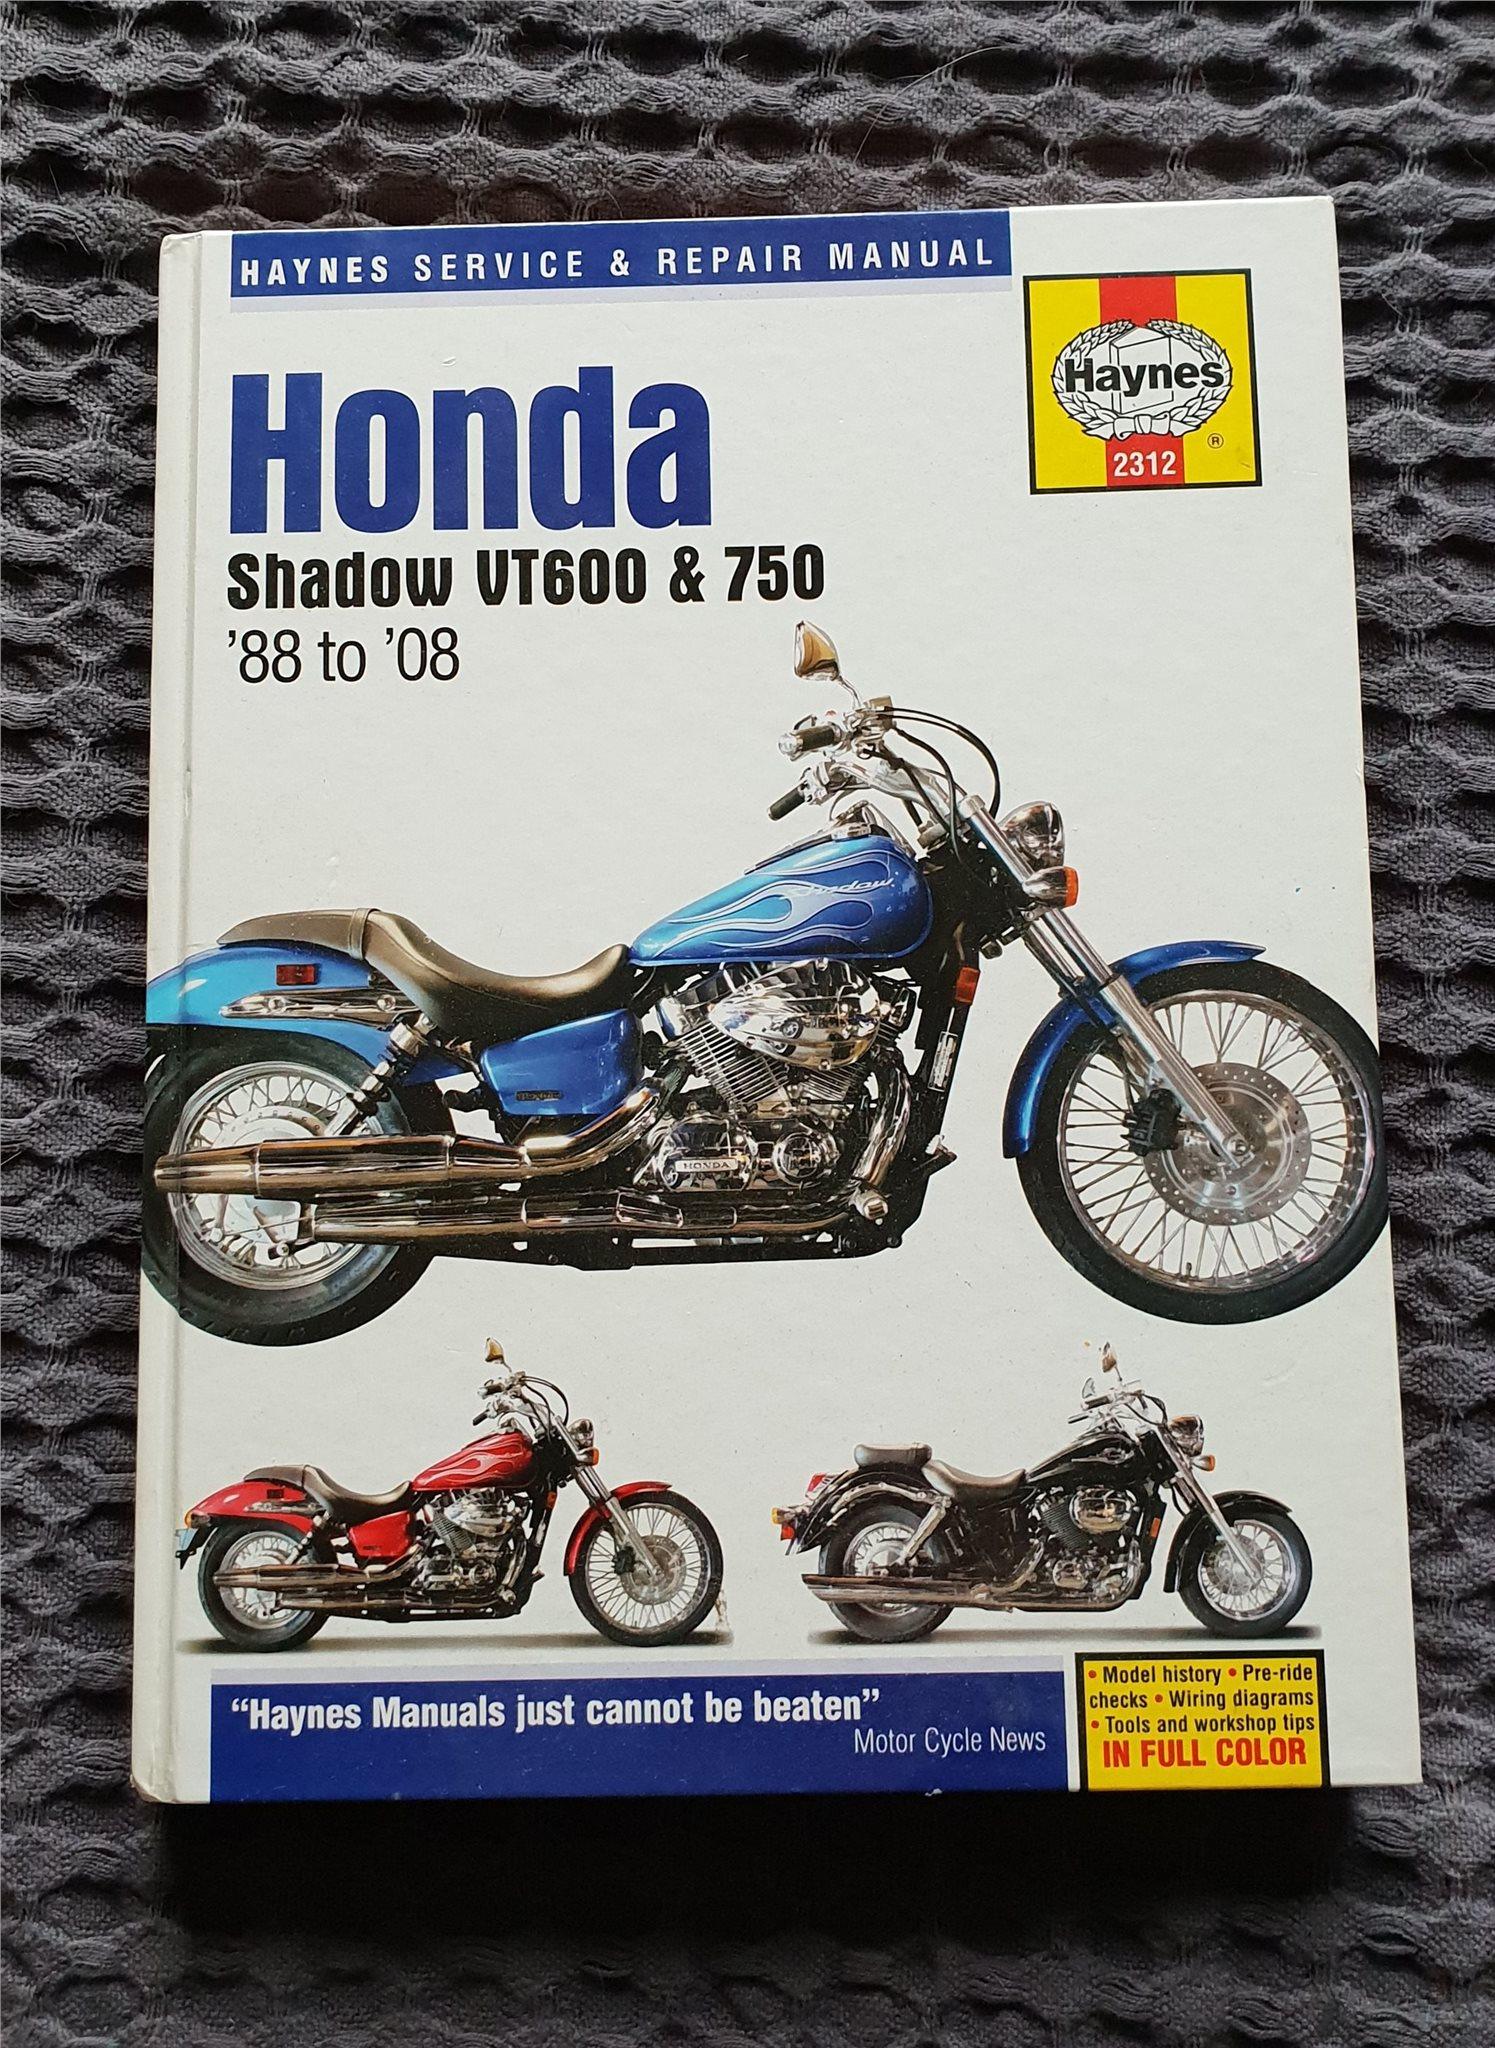 Haynes service & repair manual Honda Shadow